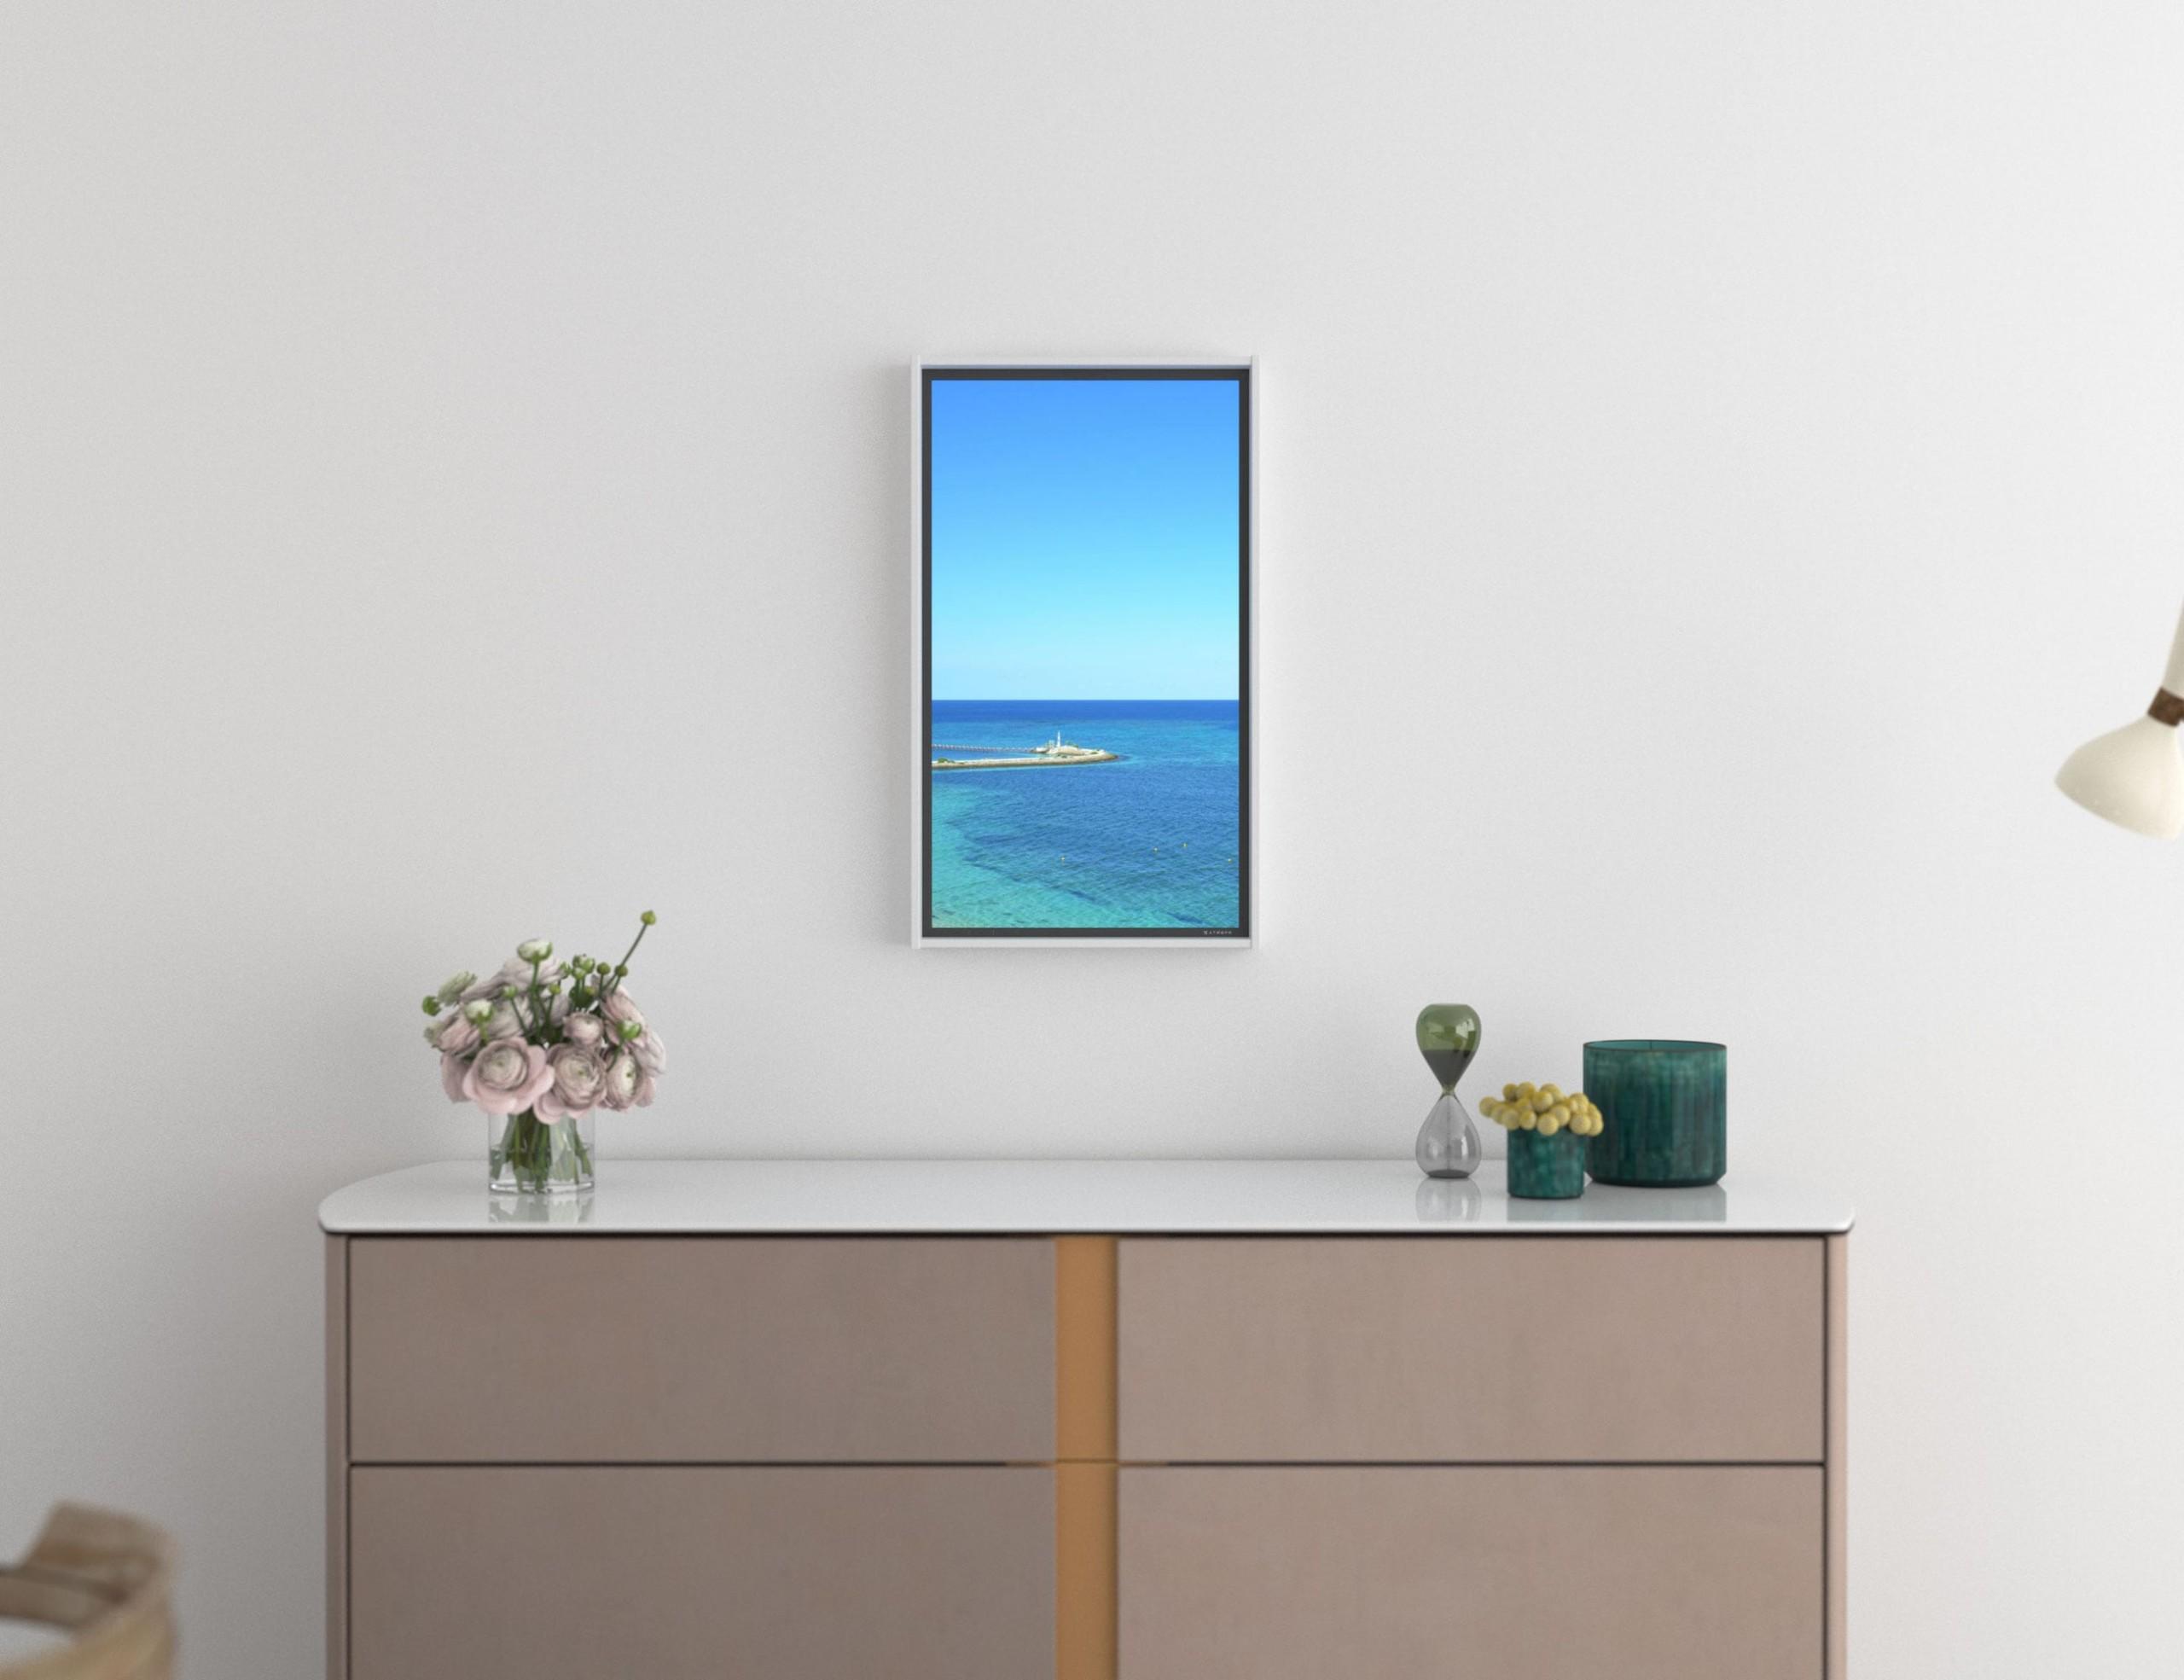 Atmoph Window 2 Smart Window Display is your window to the world